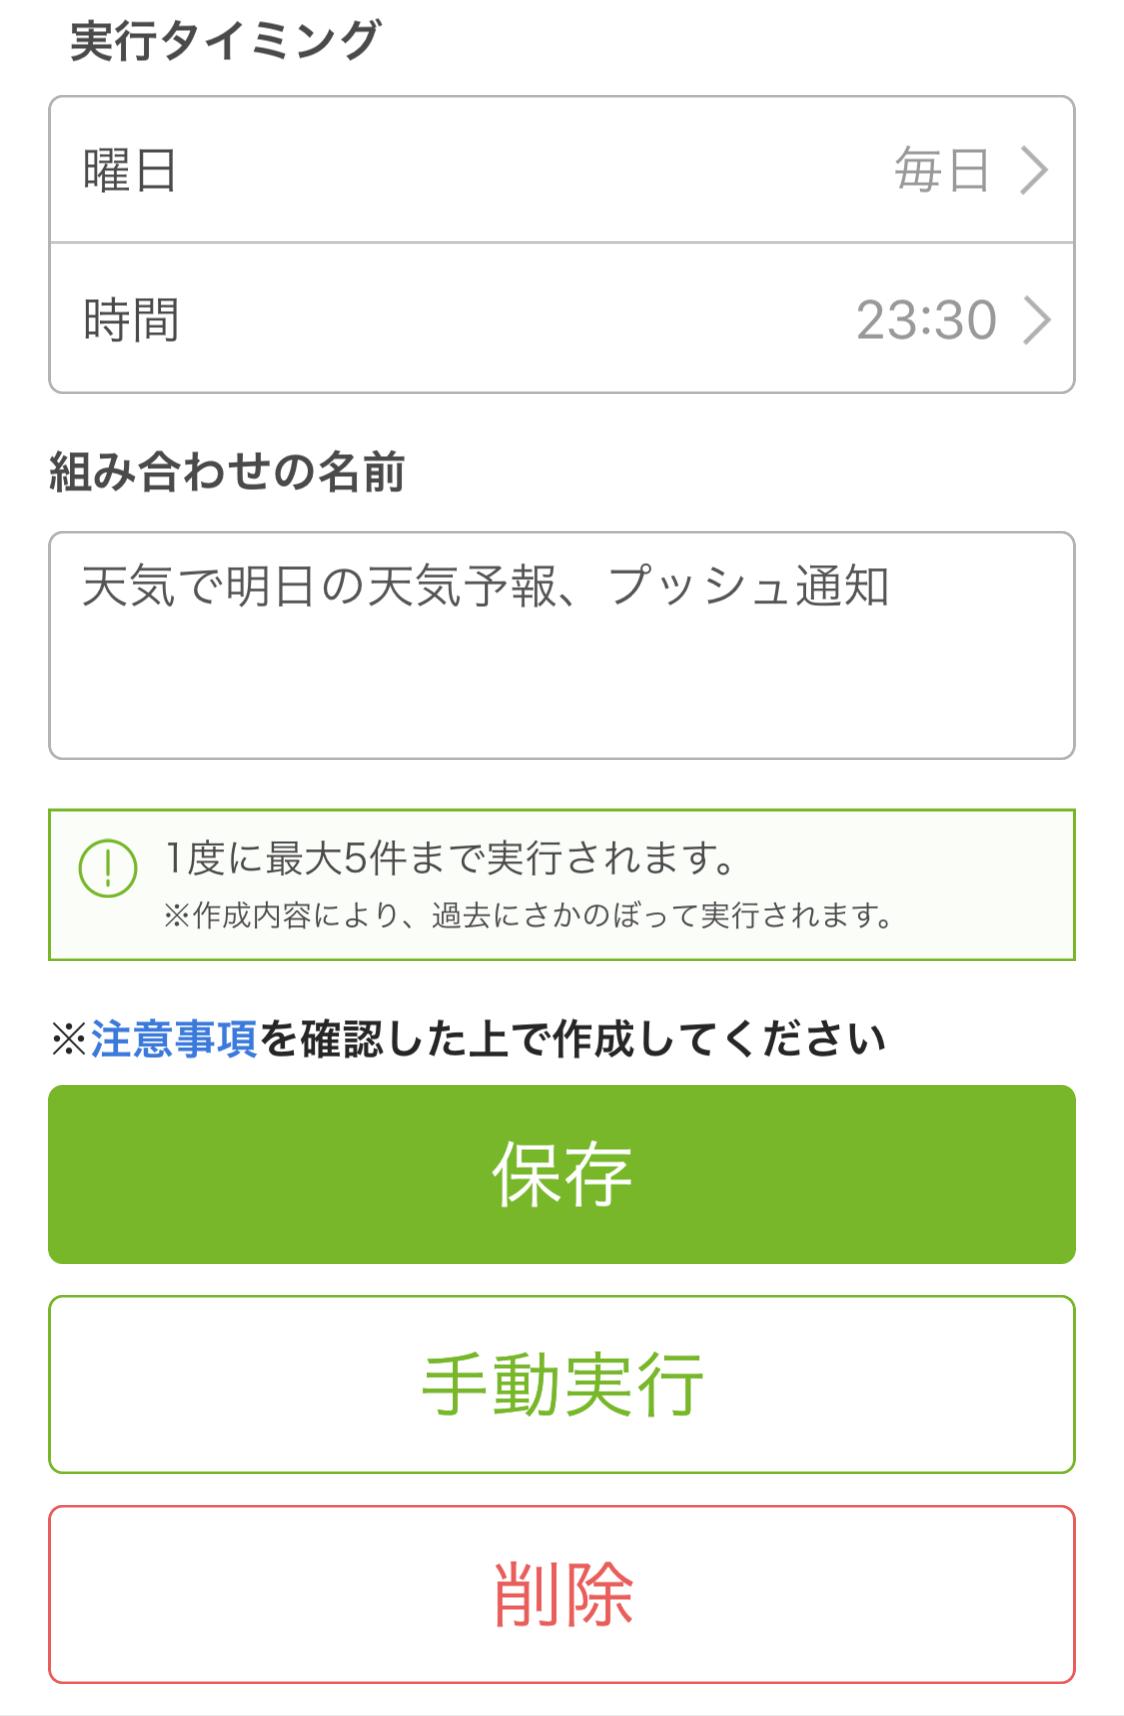 IMG 3161 2